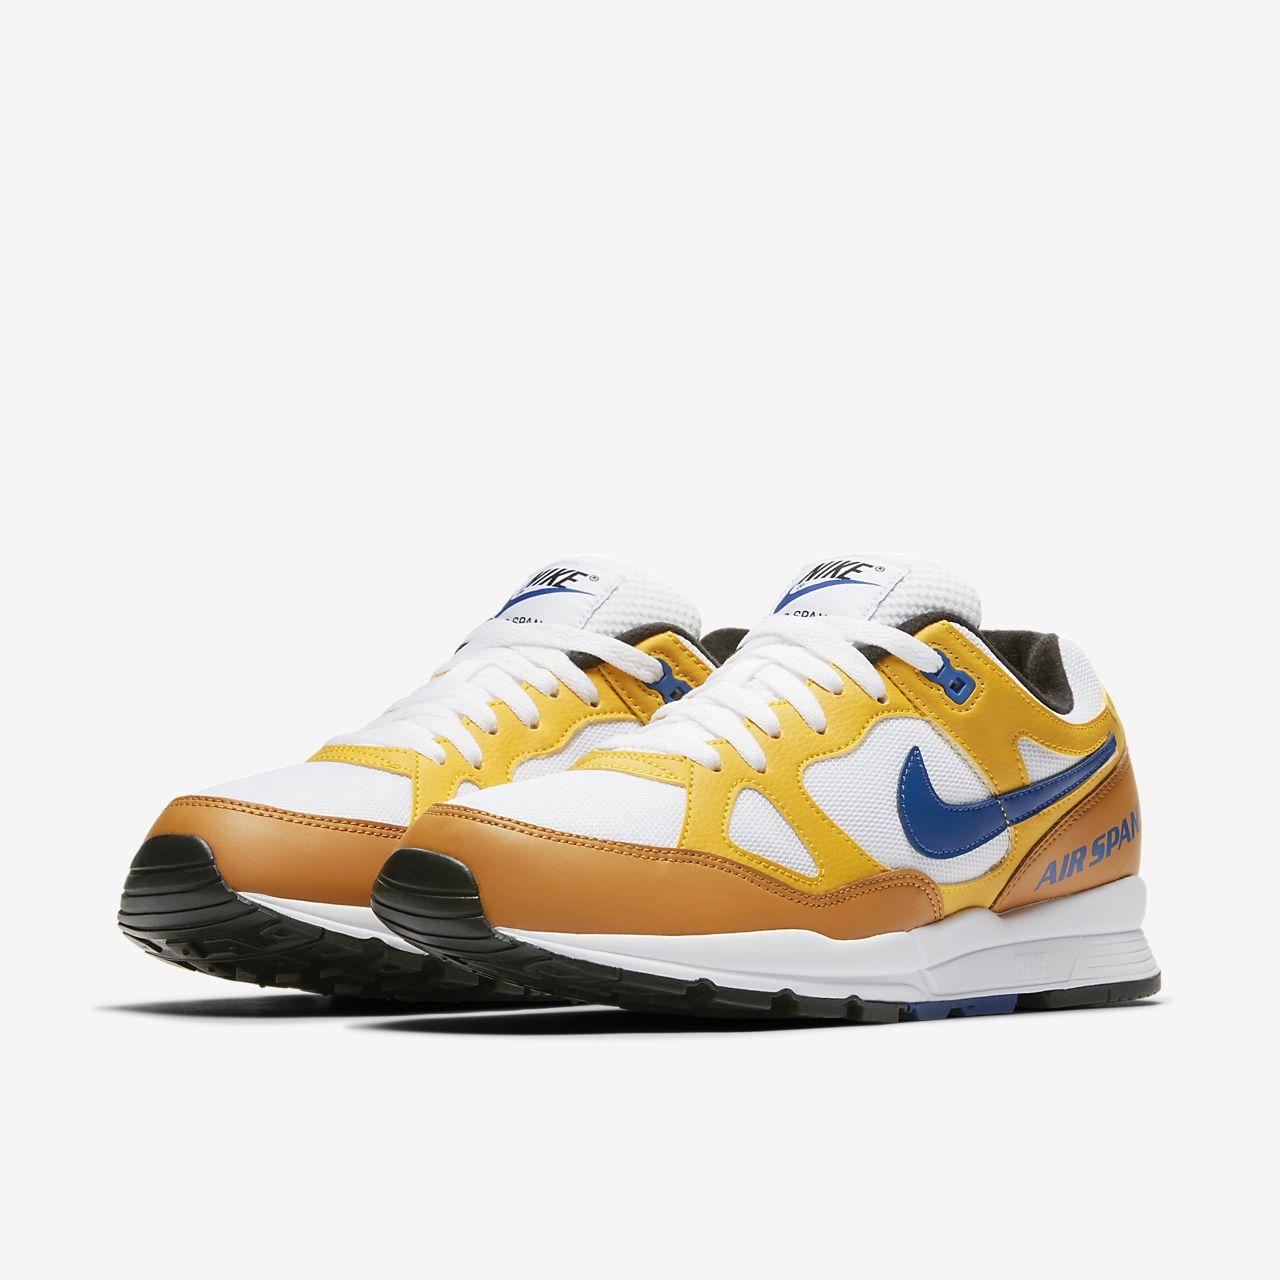 lowest price 2f067 91971 Low Resolution Nike Air Span II Men s Shoe Nike Air Span II Men s Shoe